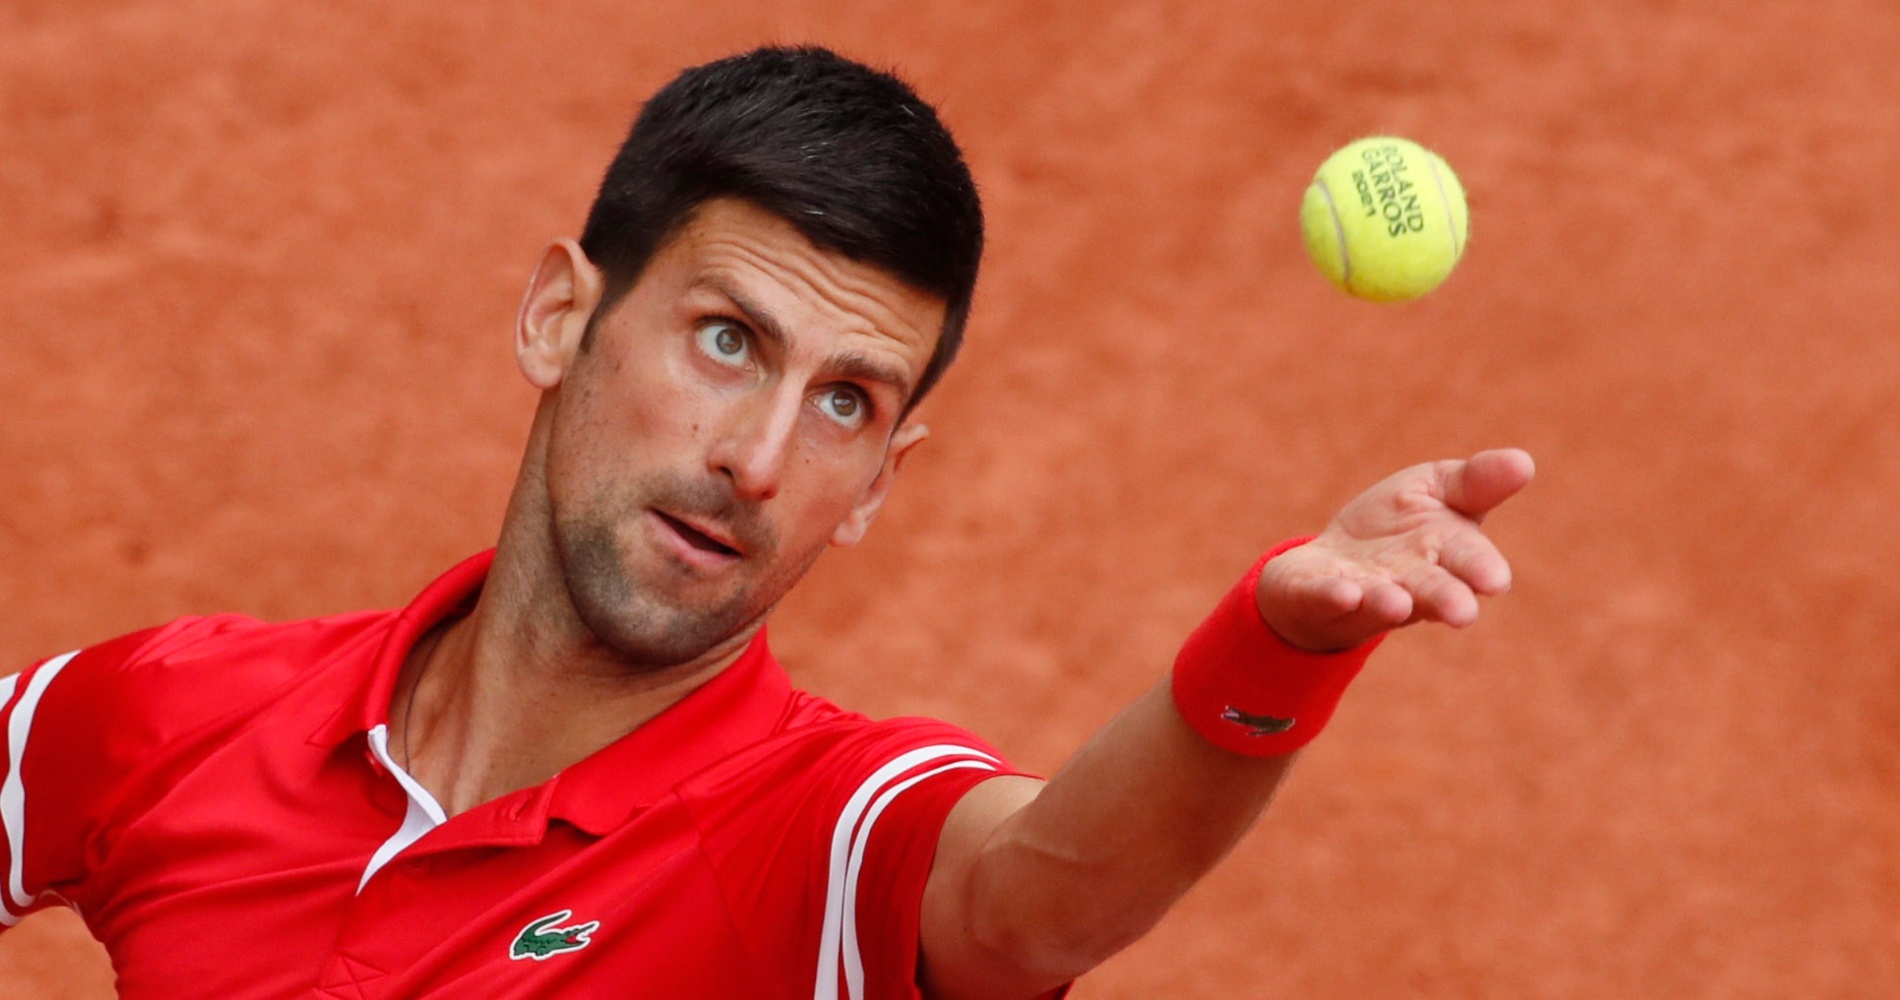 Roland Garros 2021: Novak Djokovic vs. Lorenzo Musetti Tennis Pick and Prediction